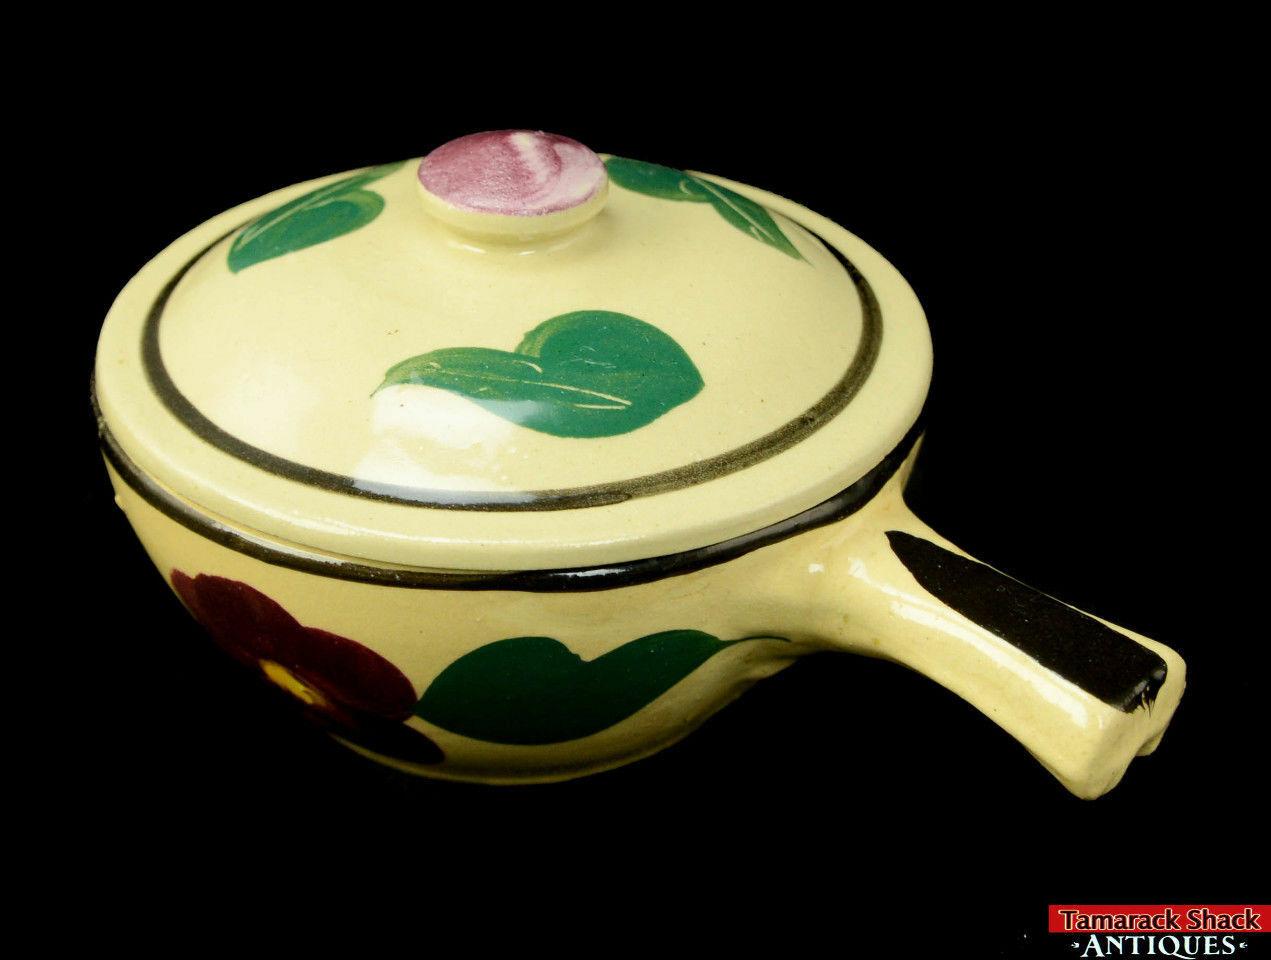 Watt-Pottery-Yellow-Ware-Individual-Covered-Stick-Casserole-Lid-Rio-Rose-VTG-L5Y-291840820870-2.jpg